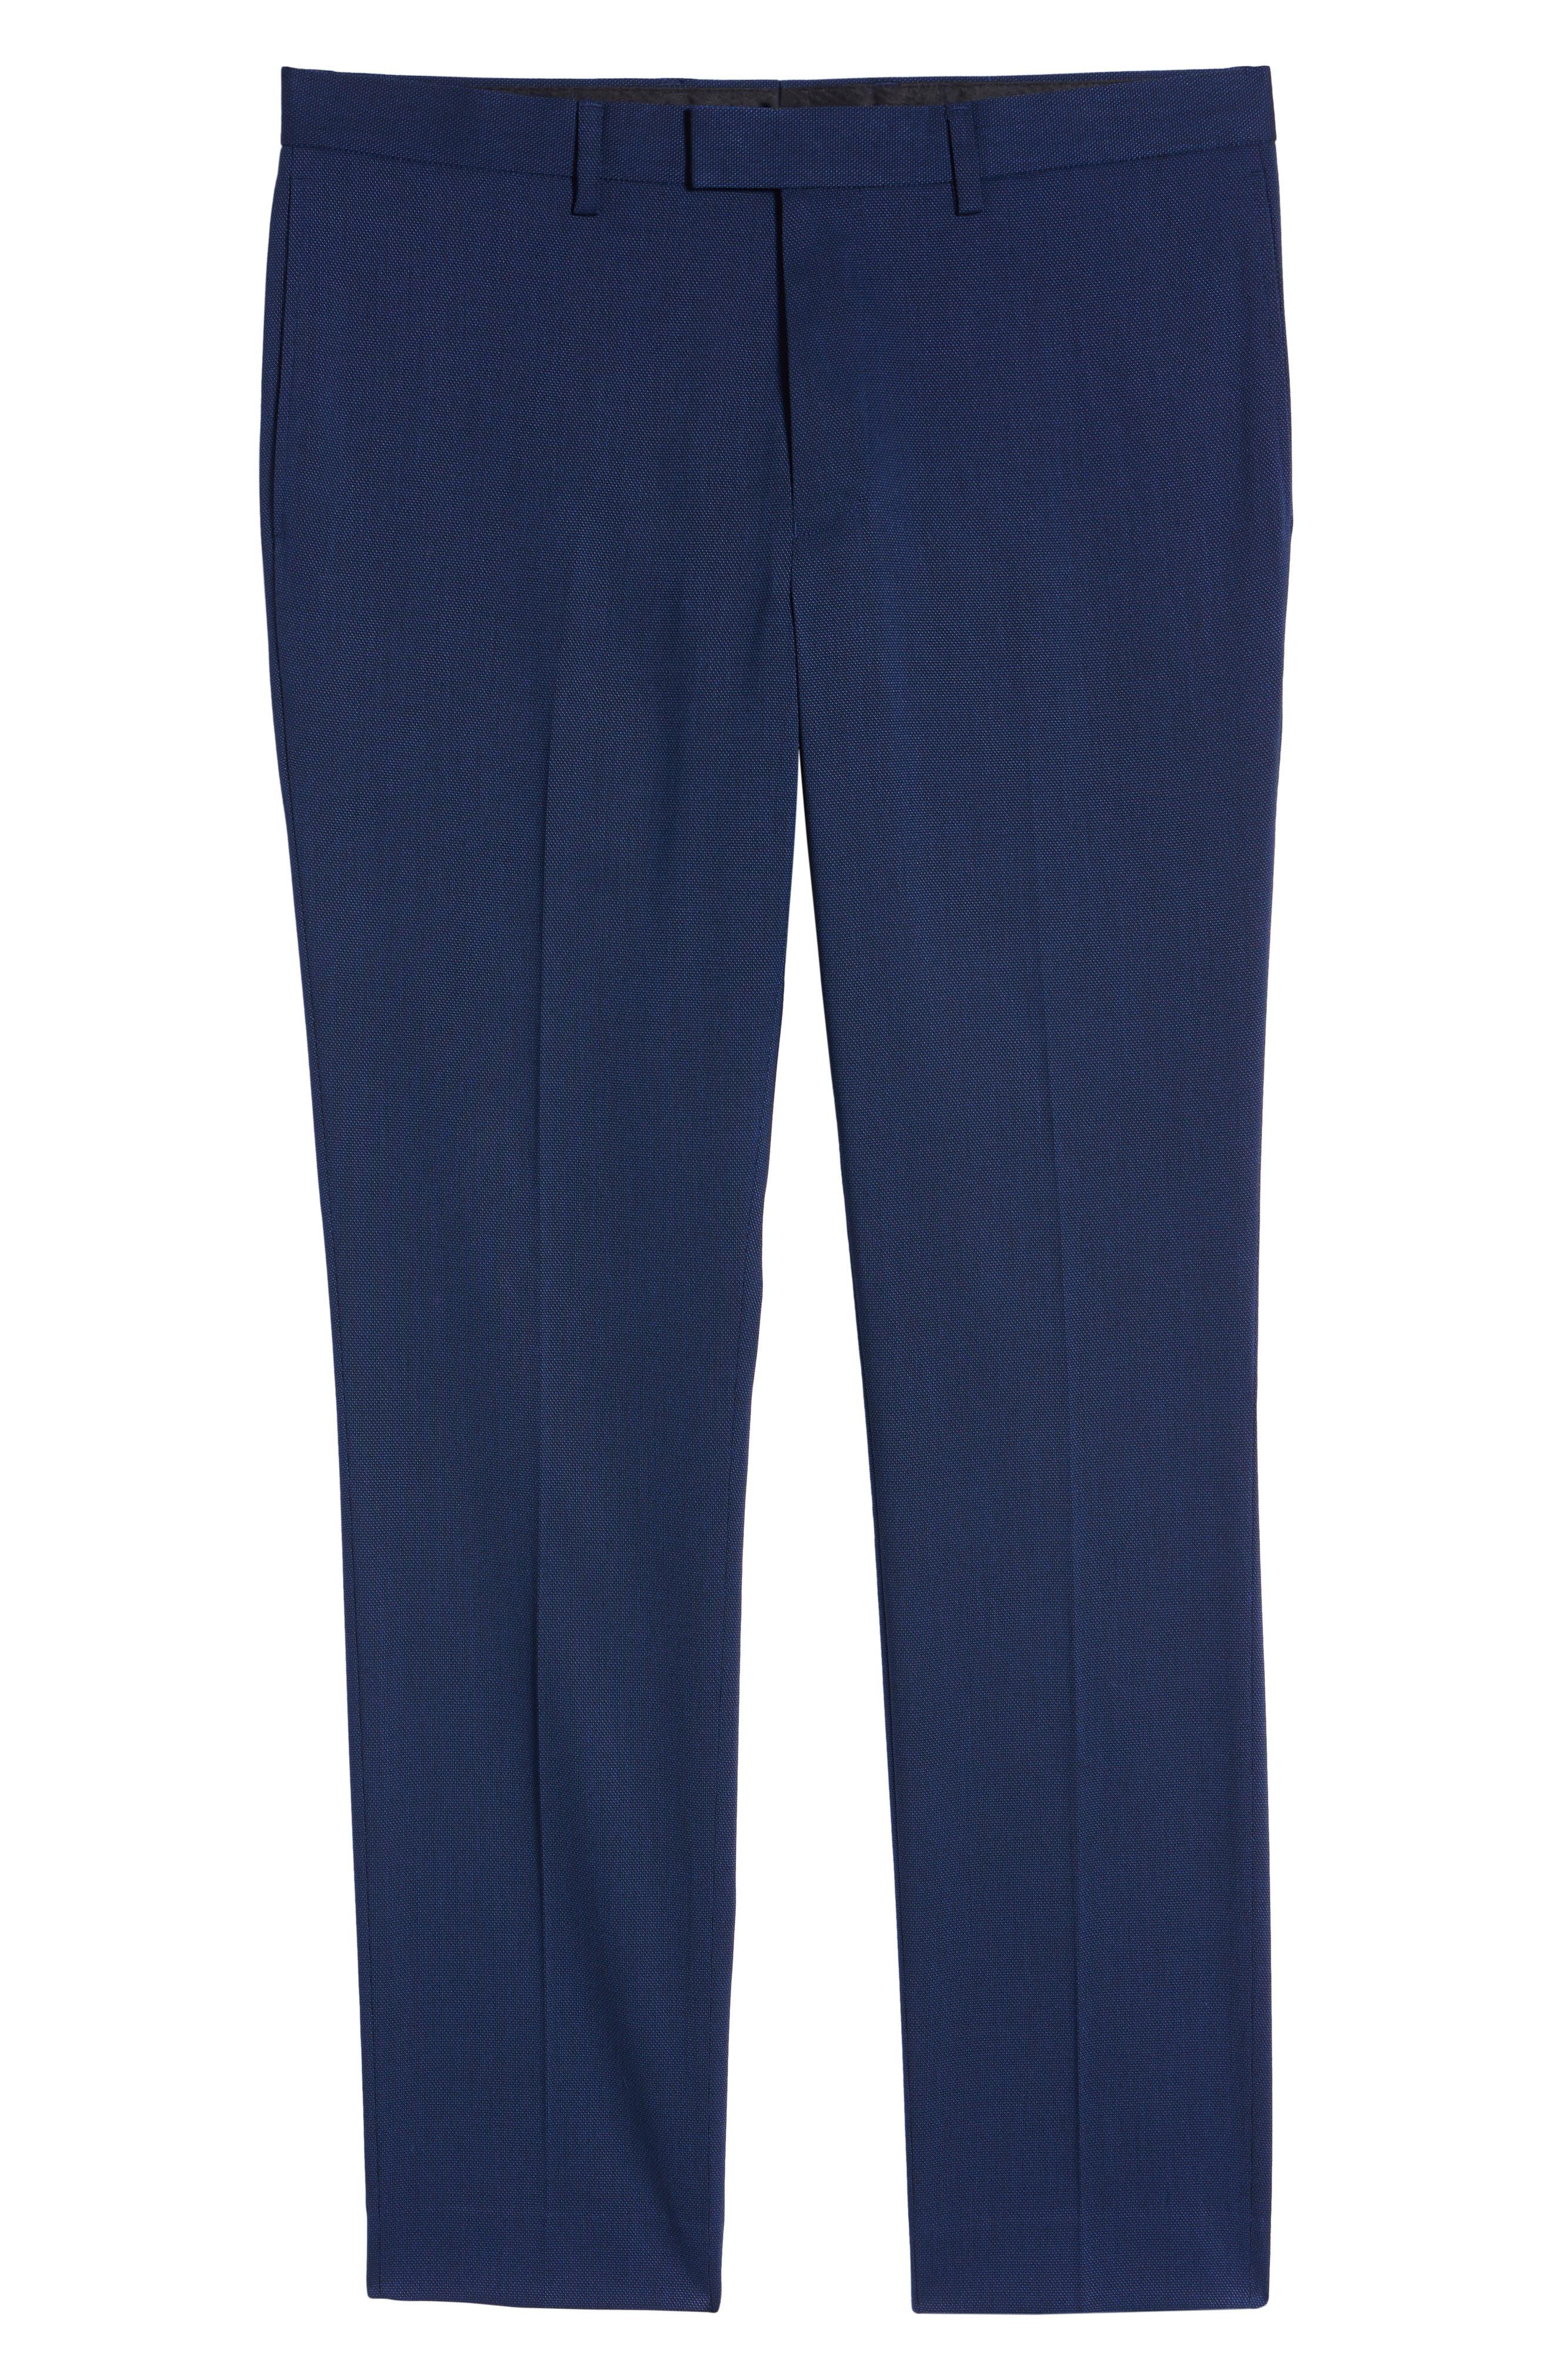 TOPMAN, Skinny Fit Suit Pants, Alternate thumbnail 5, color, MID BLUE